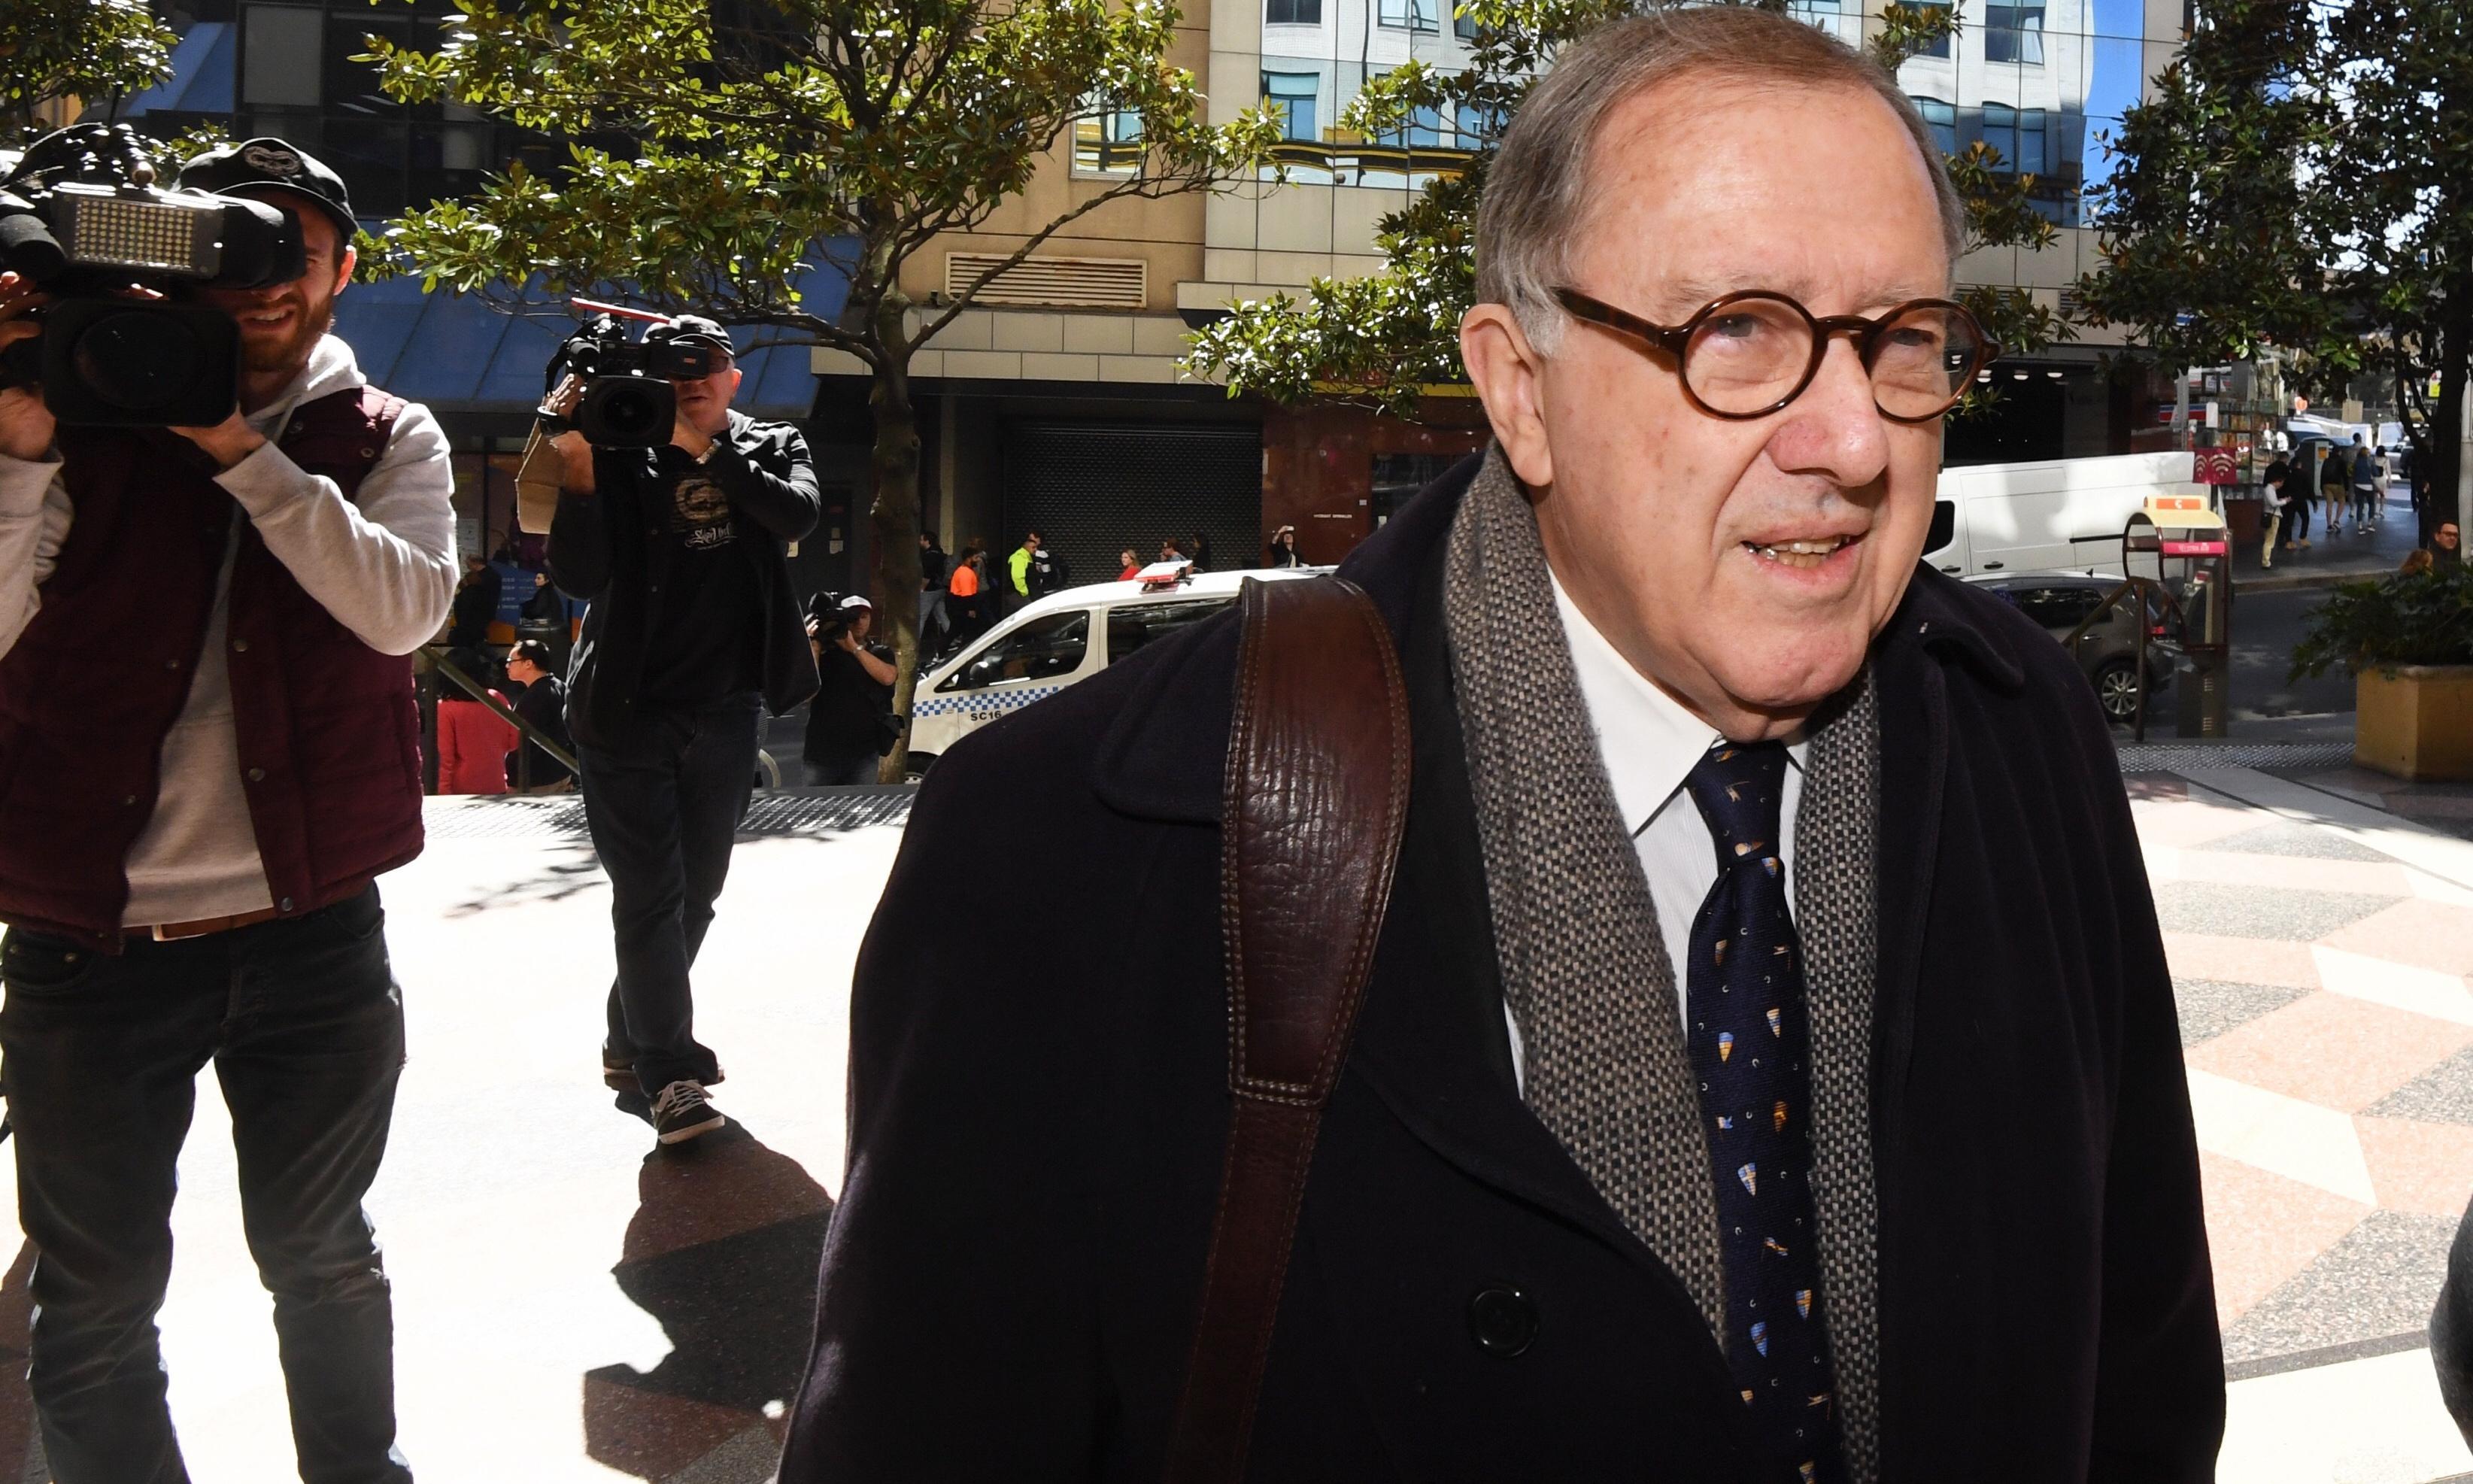 Former magistrate Graeme Curran jailed for indecently assaulting underage boy